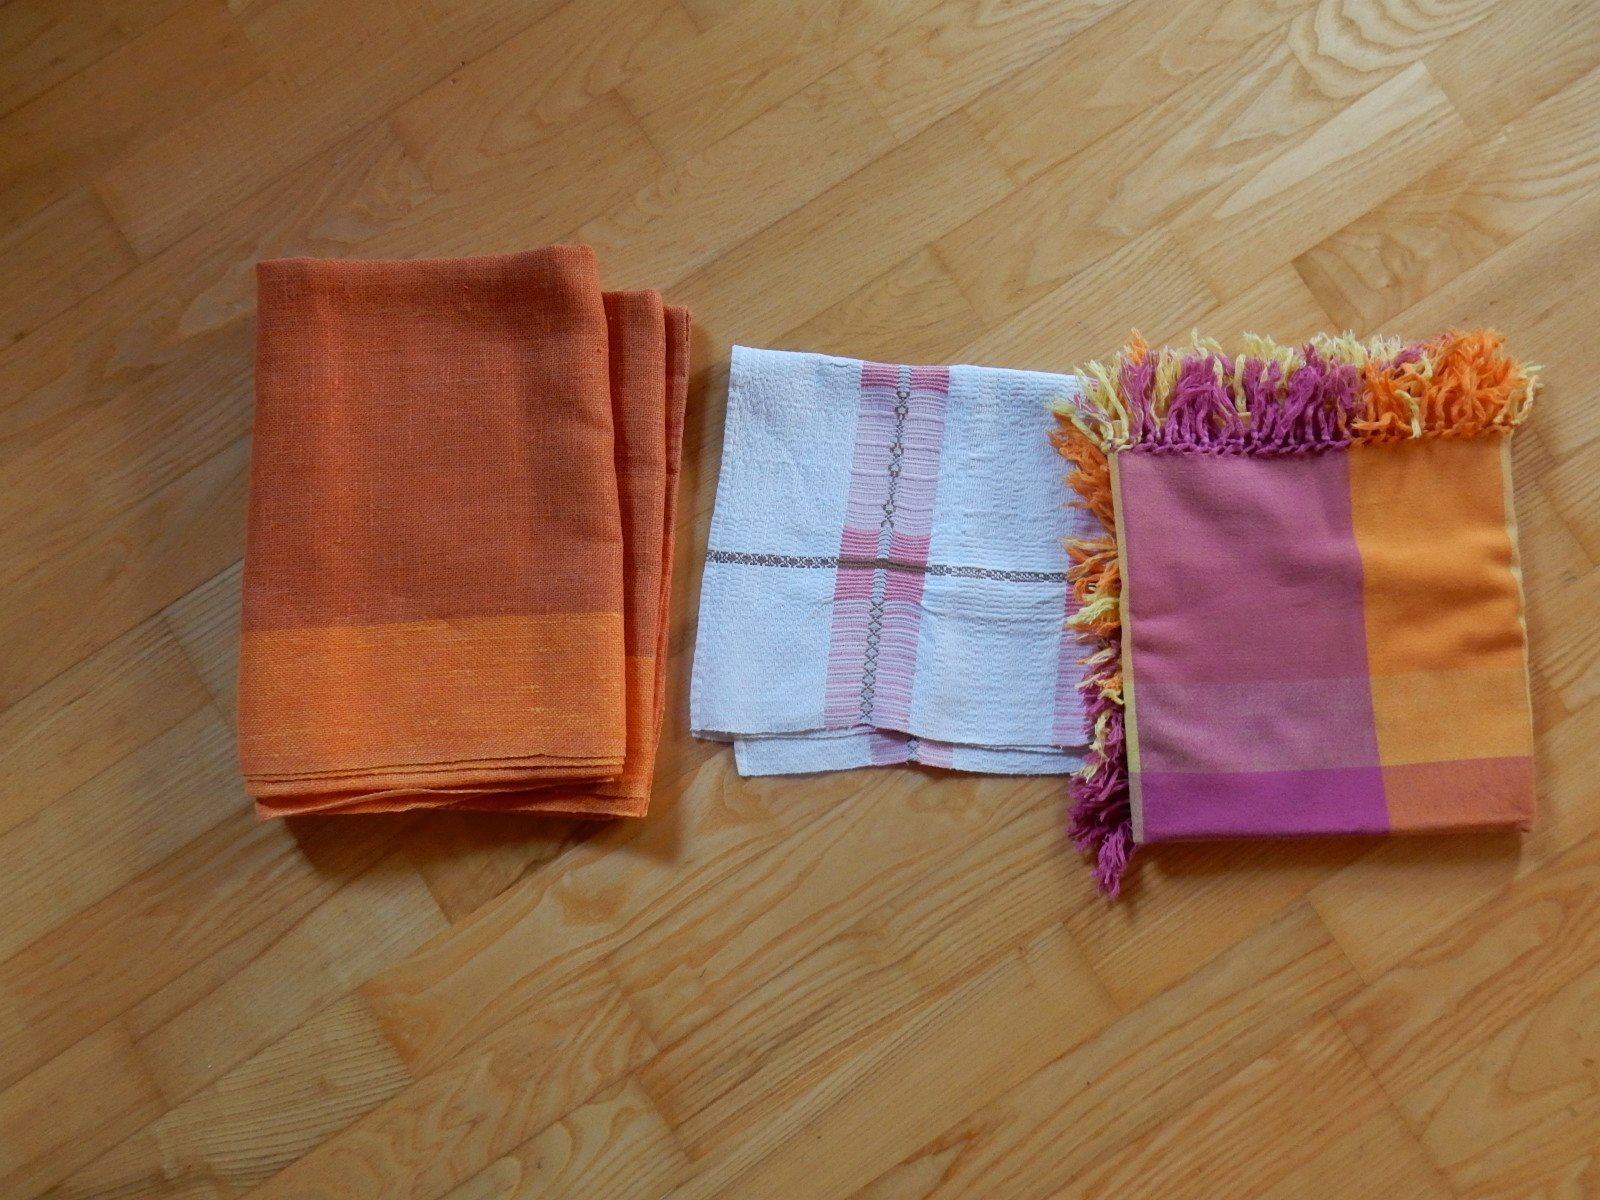 Fin äldre linneduk i olika orange färger 146 x1.. (335557419) ᐈ Köp ... a959d8dae2acf